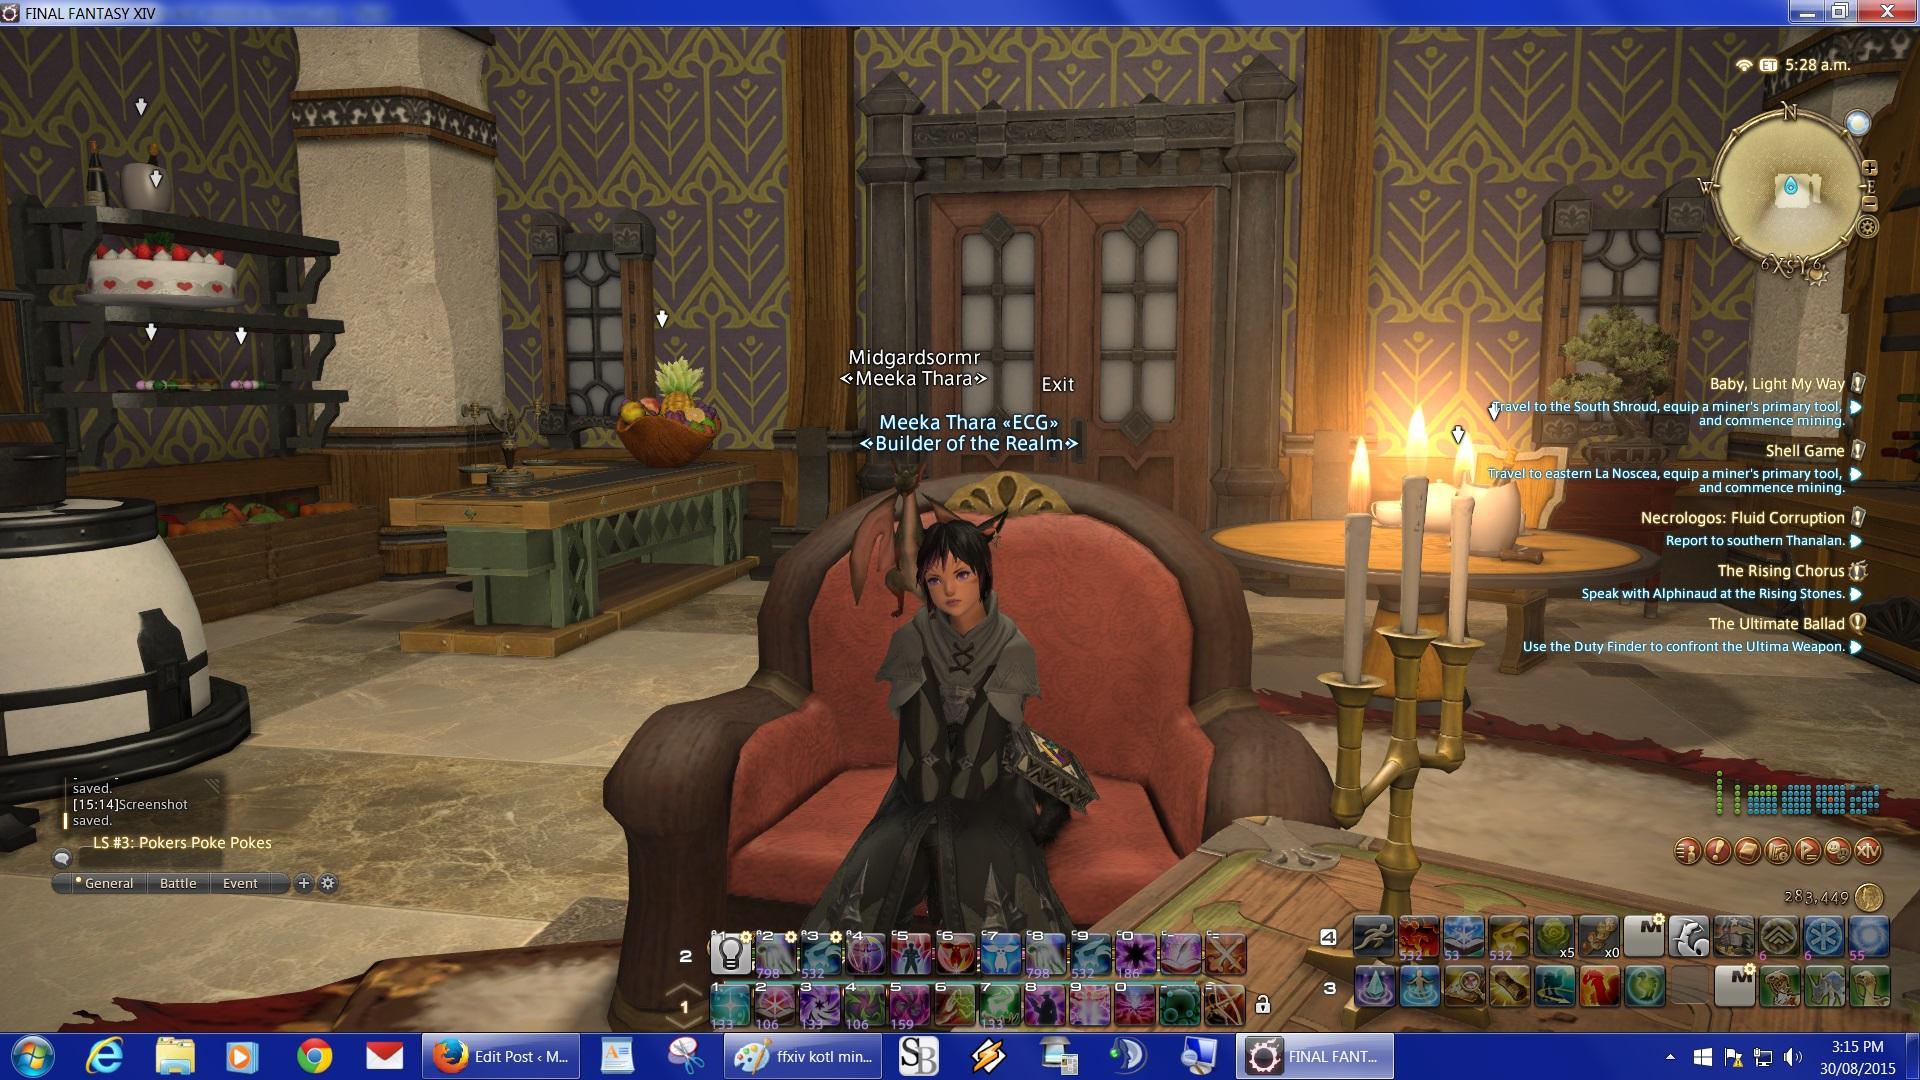 ffxiv kotl minion in house3